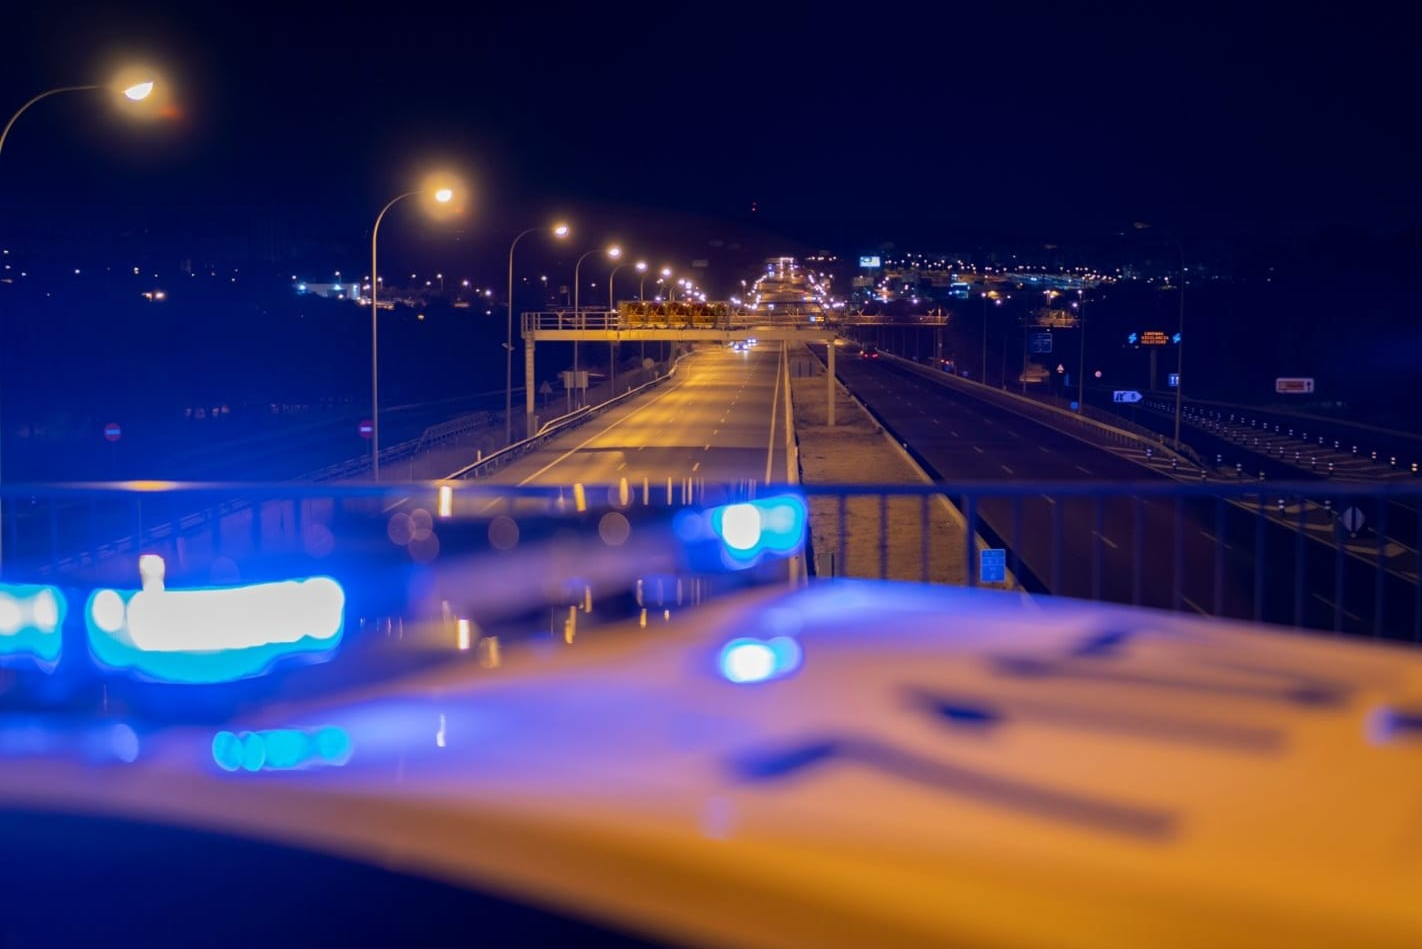 Police enforcing road laws